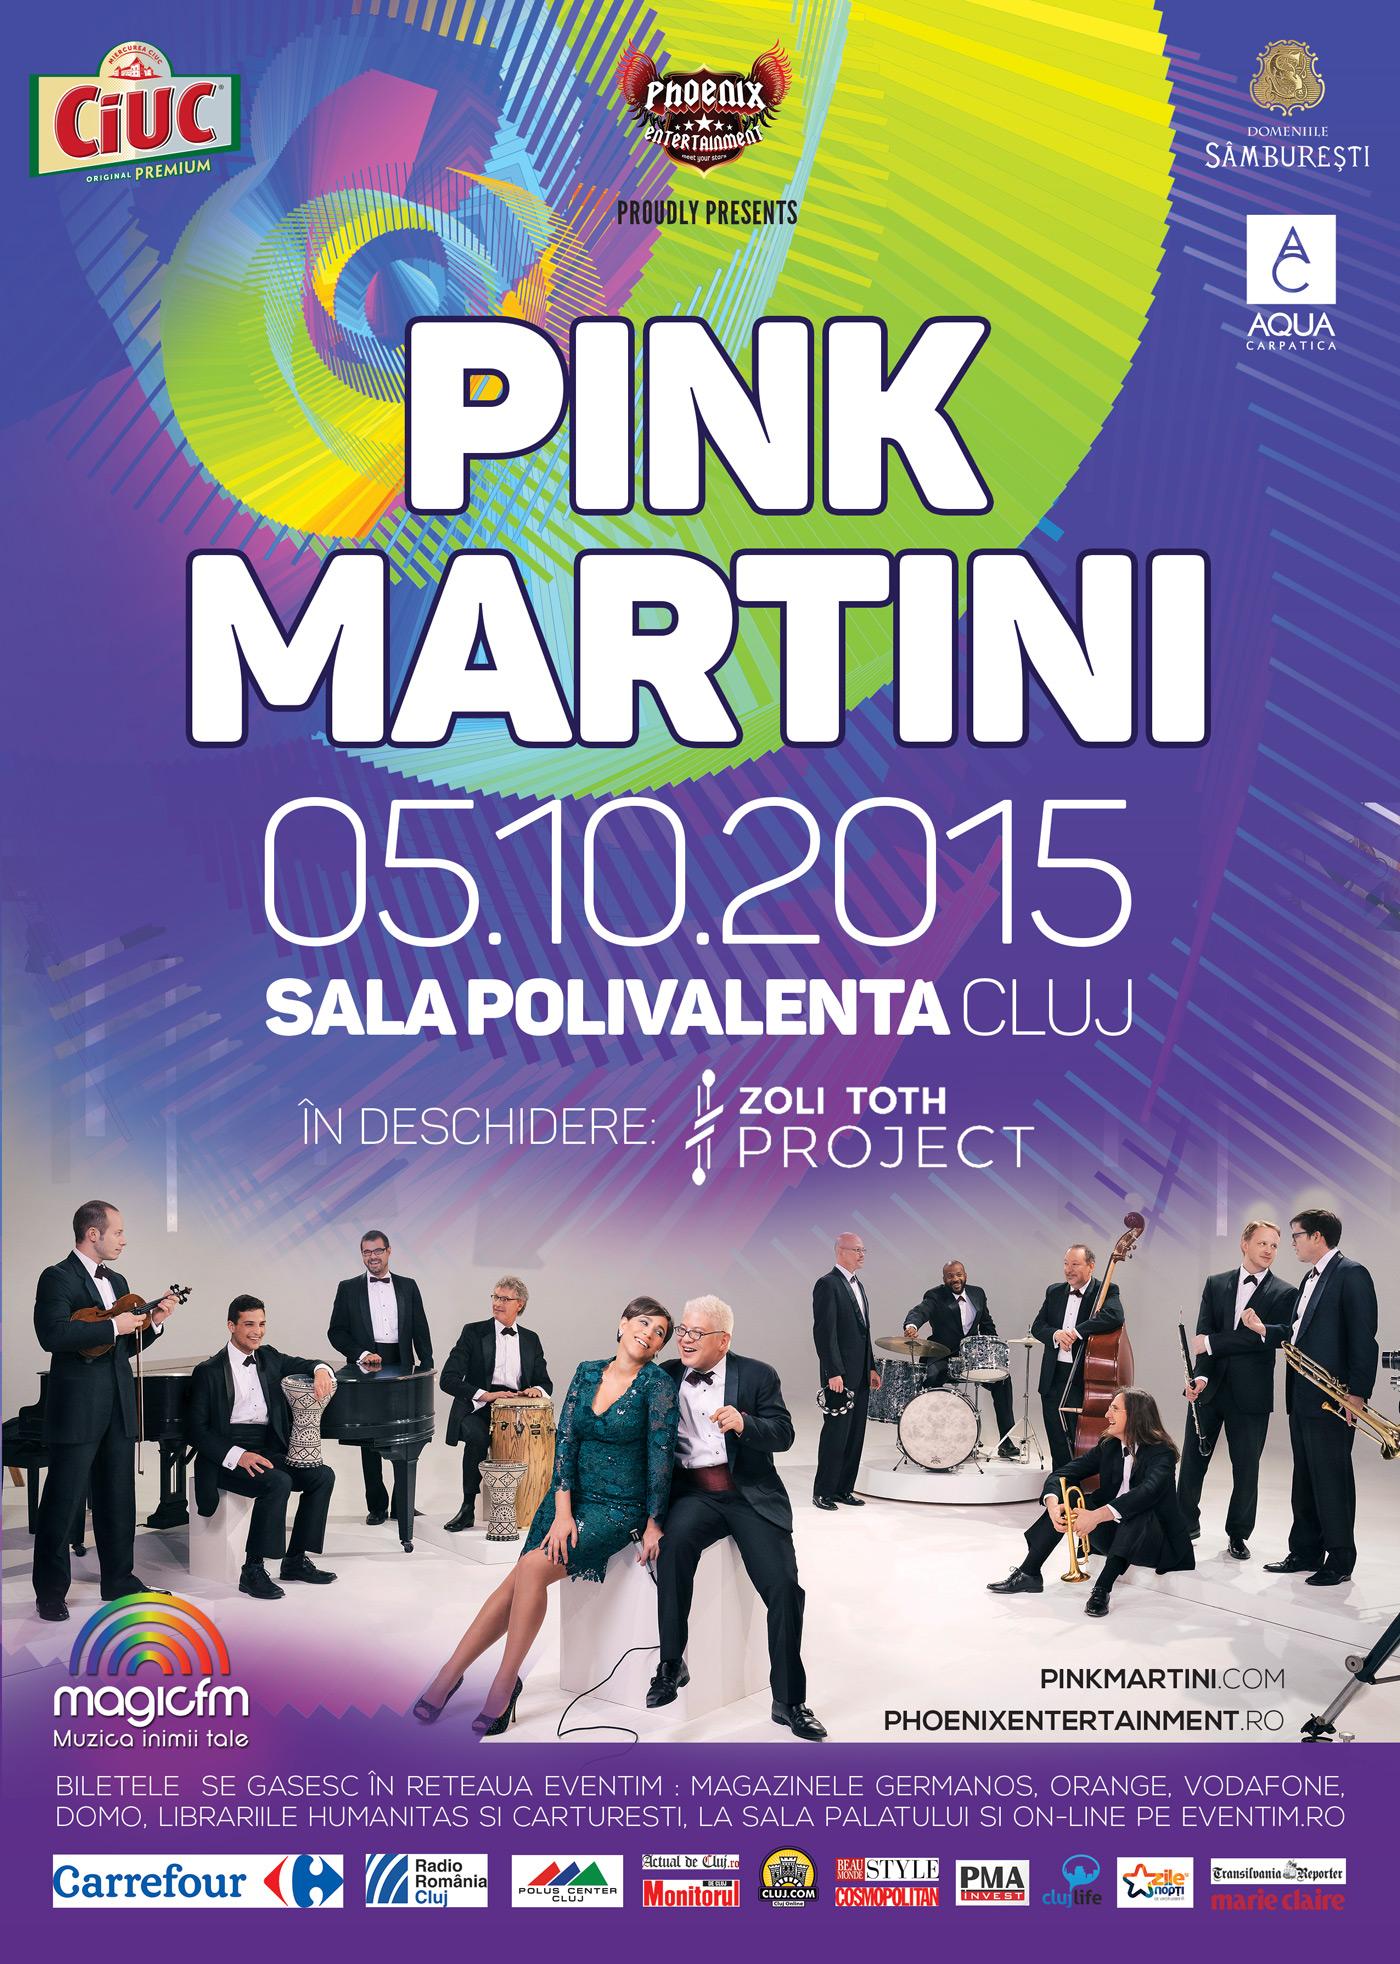 Zoli Toth Project deschide concertul Pink Martini